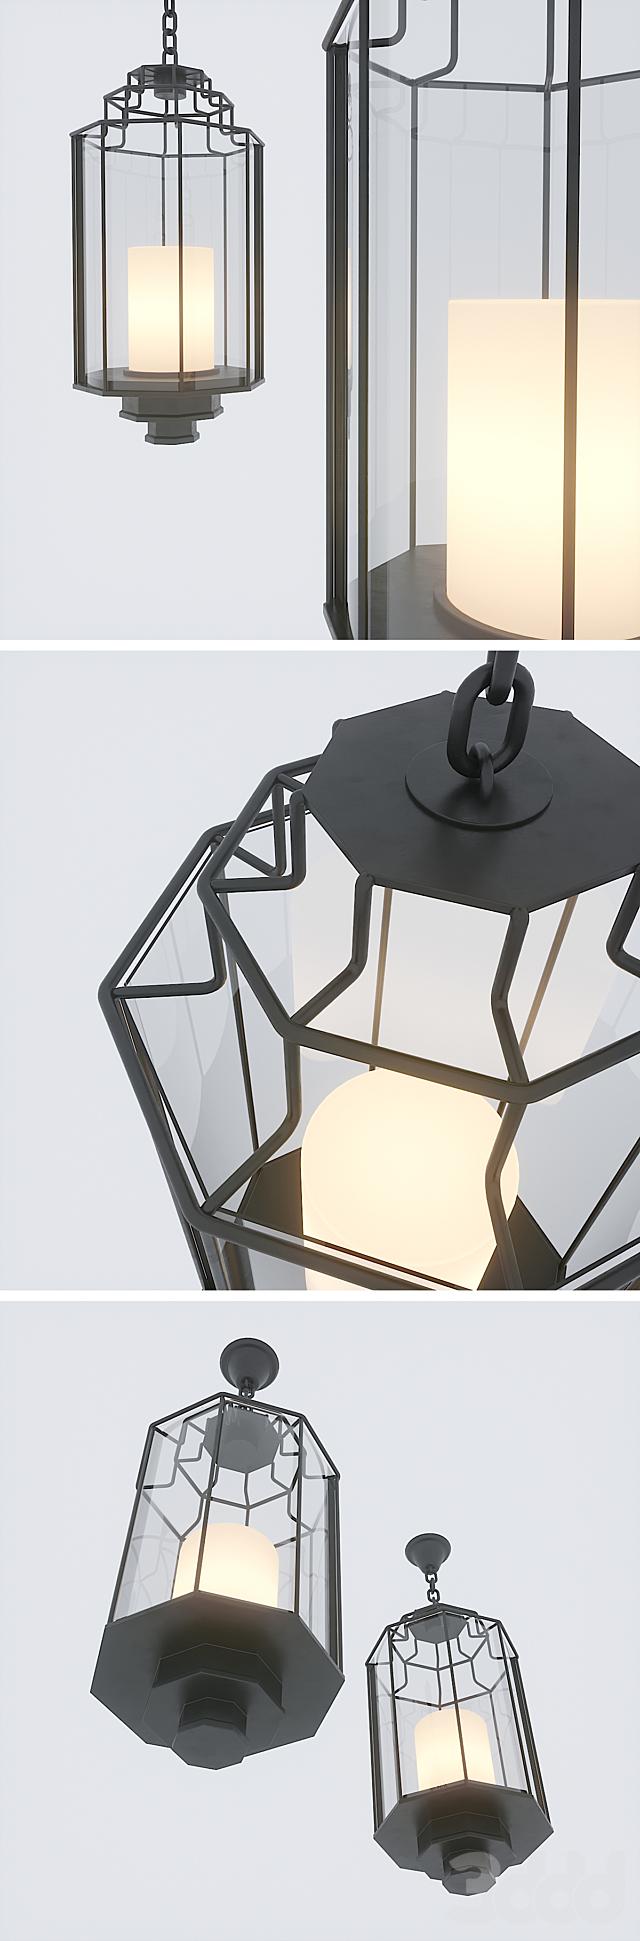 EICHHOLTZ Lantern Monticello